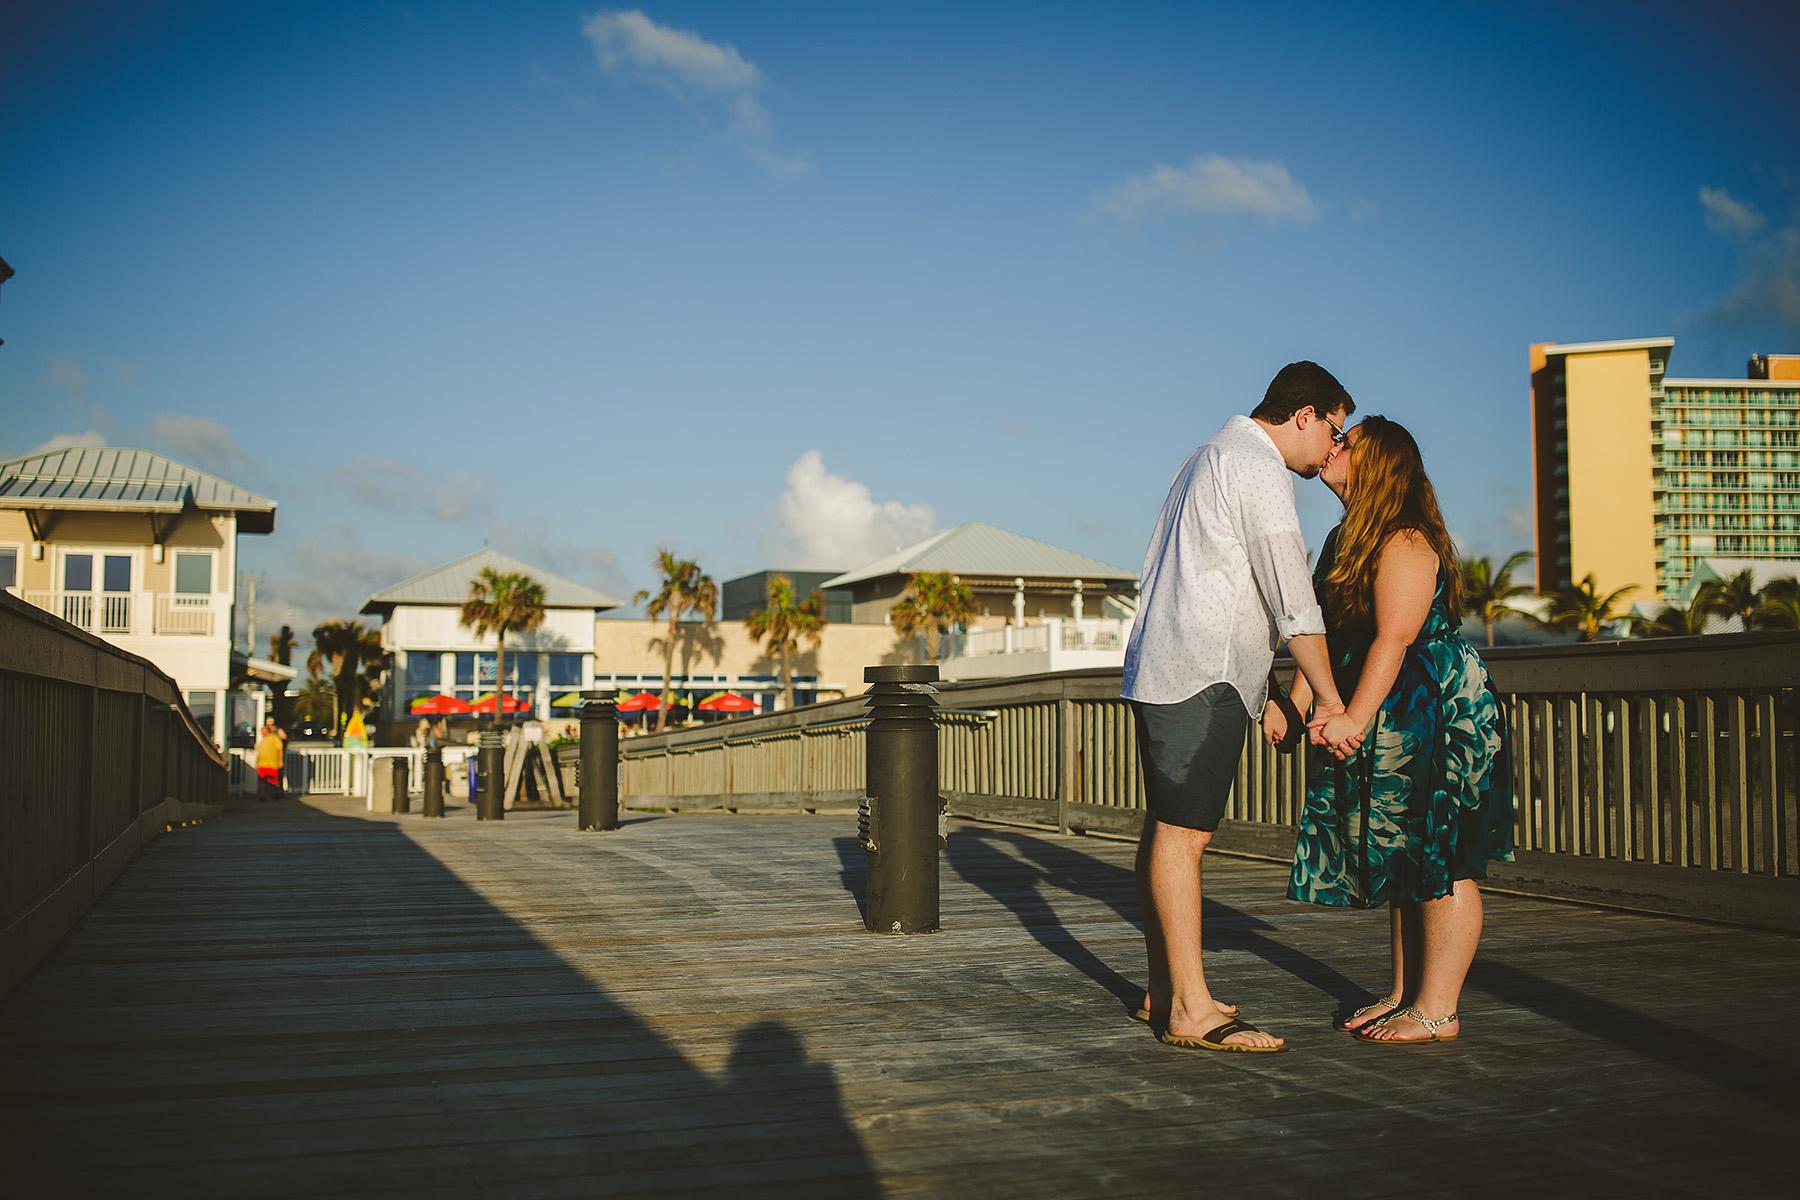 pier-kissing-couple-tiny-house-photo-florida.jpg